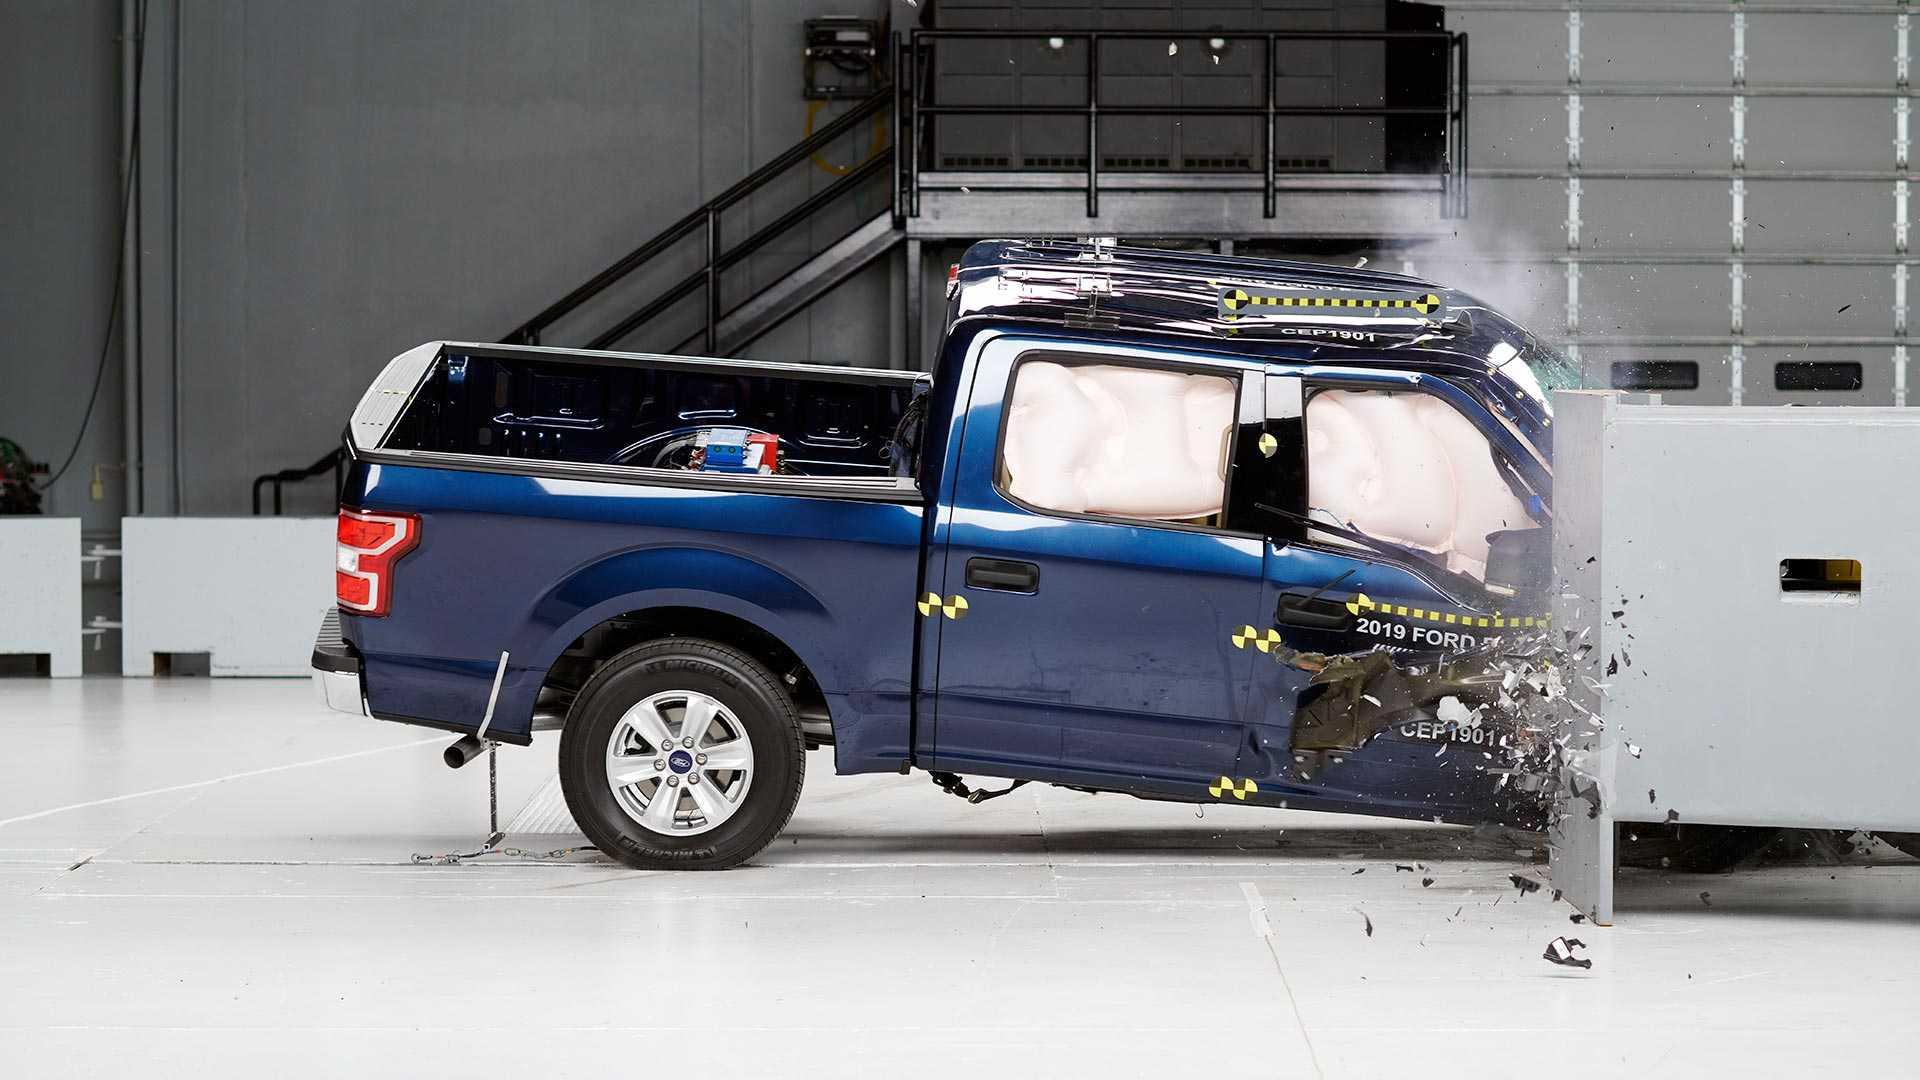 2019-ford-f-150-supercrew-crash-test (1)